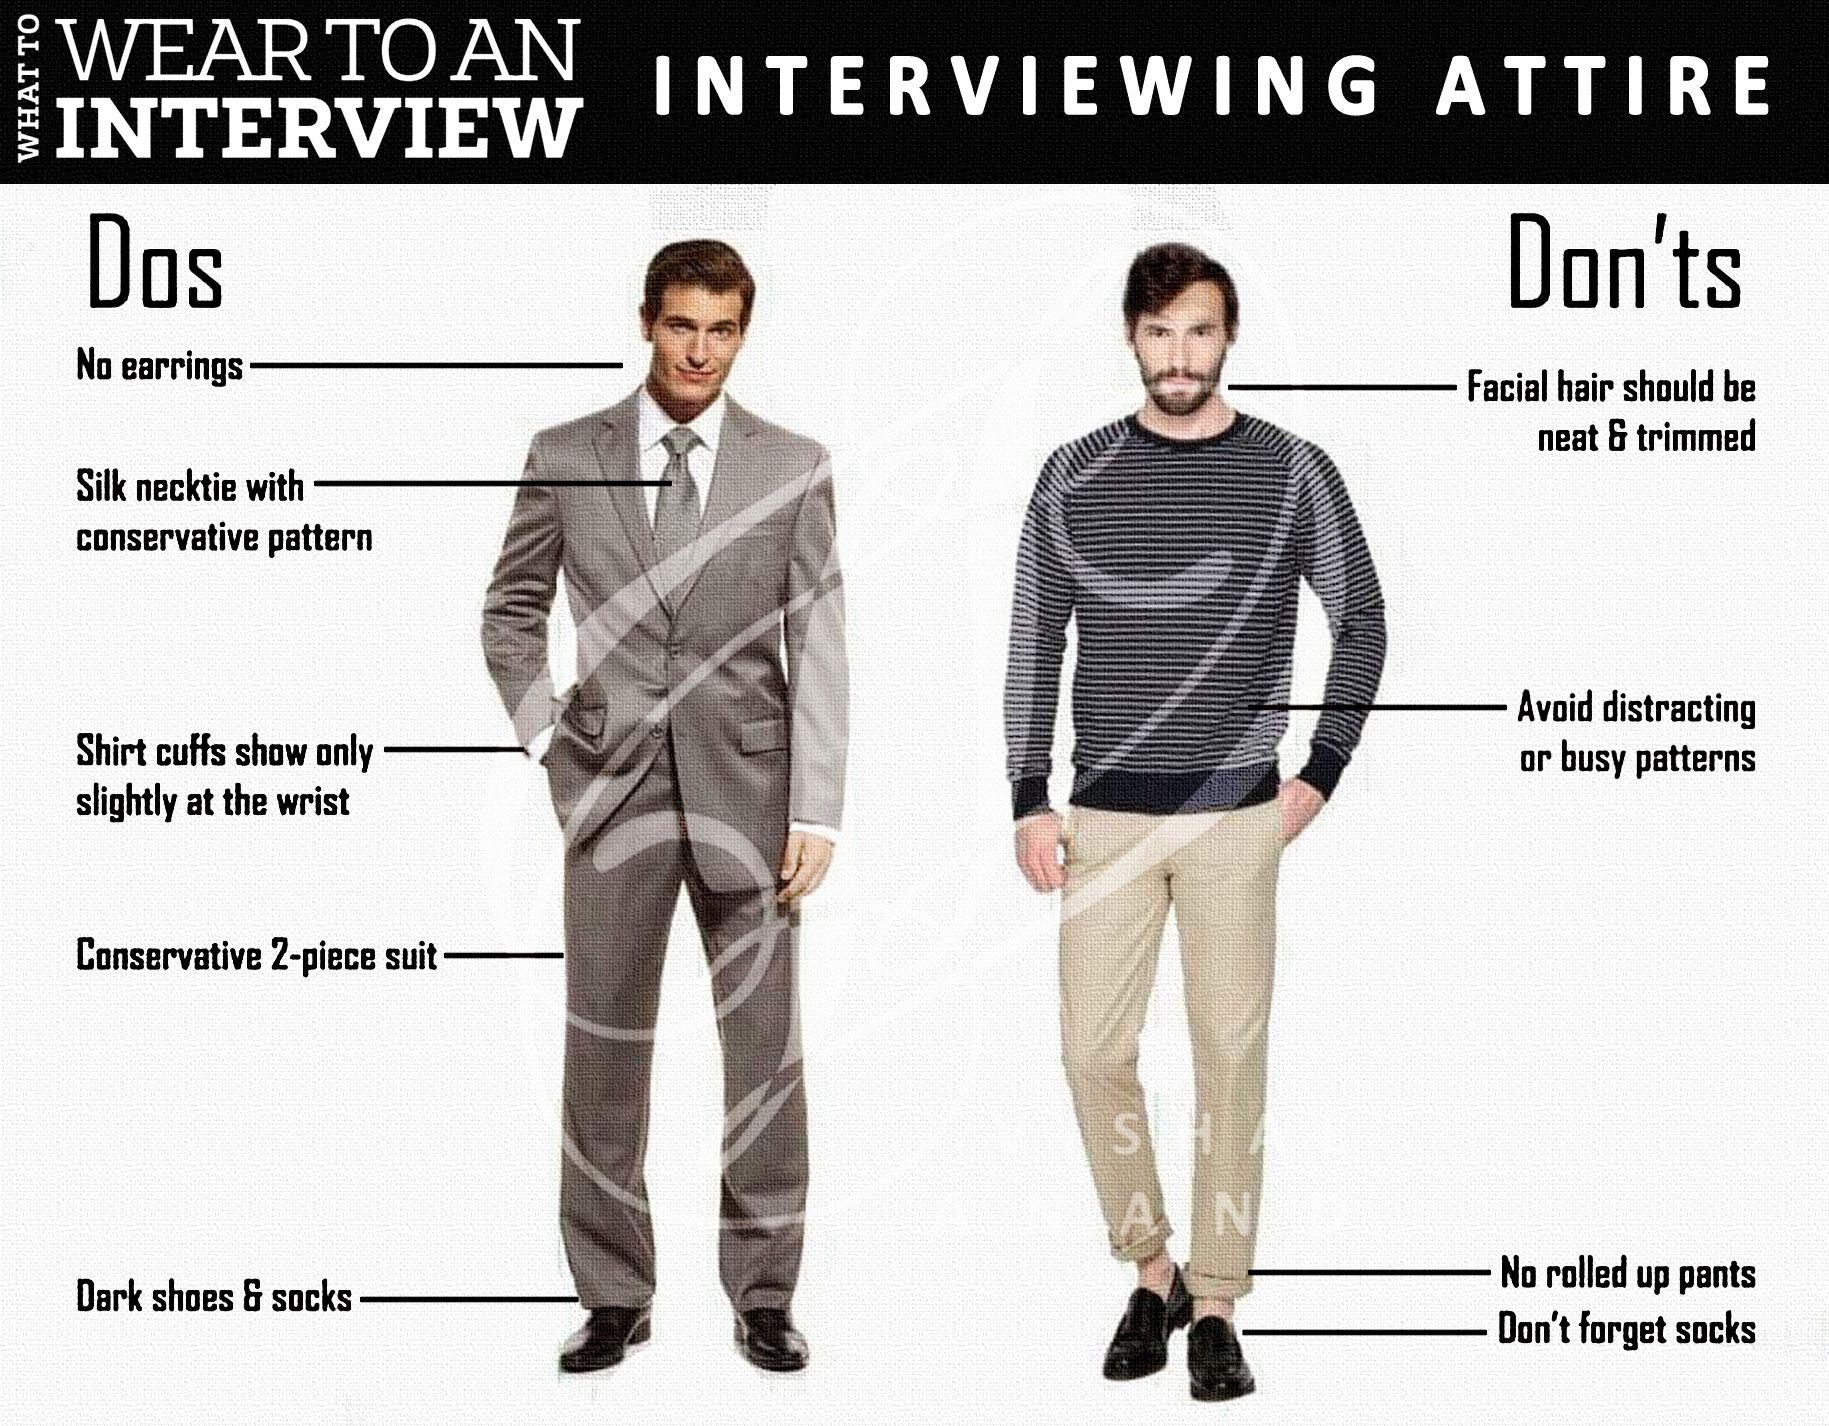 Interviewing Attire Men S Business Casual Attire Shirt Cuff Business Attire Women